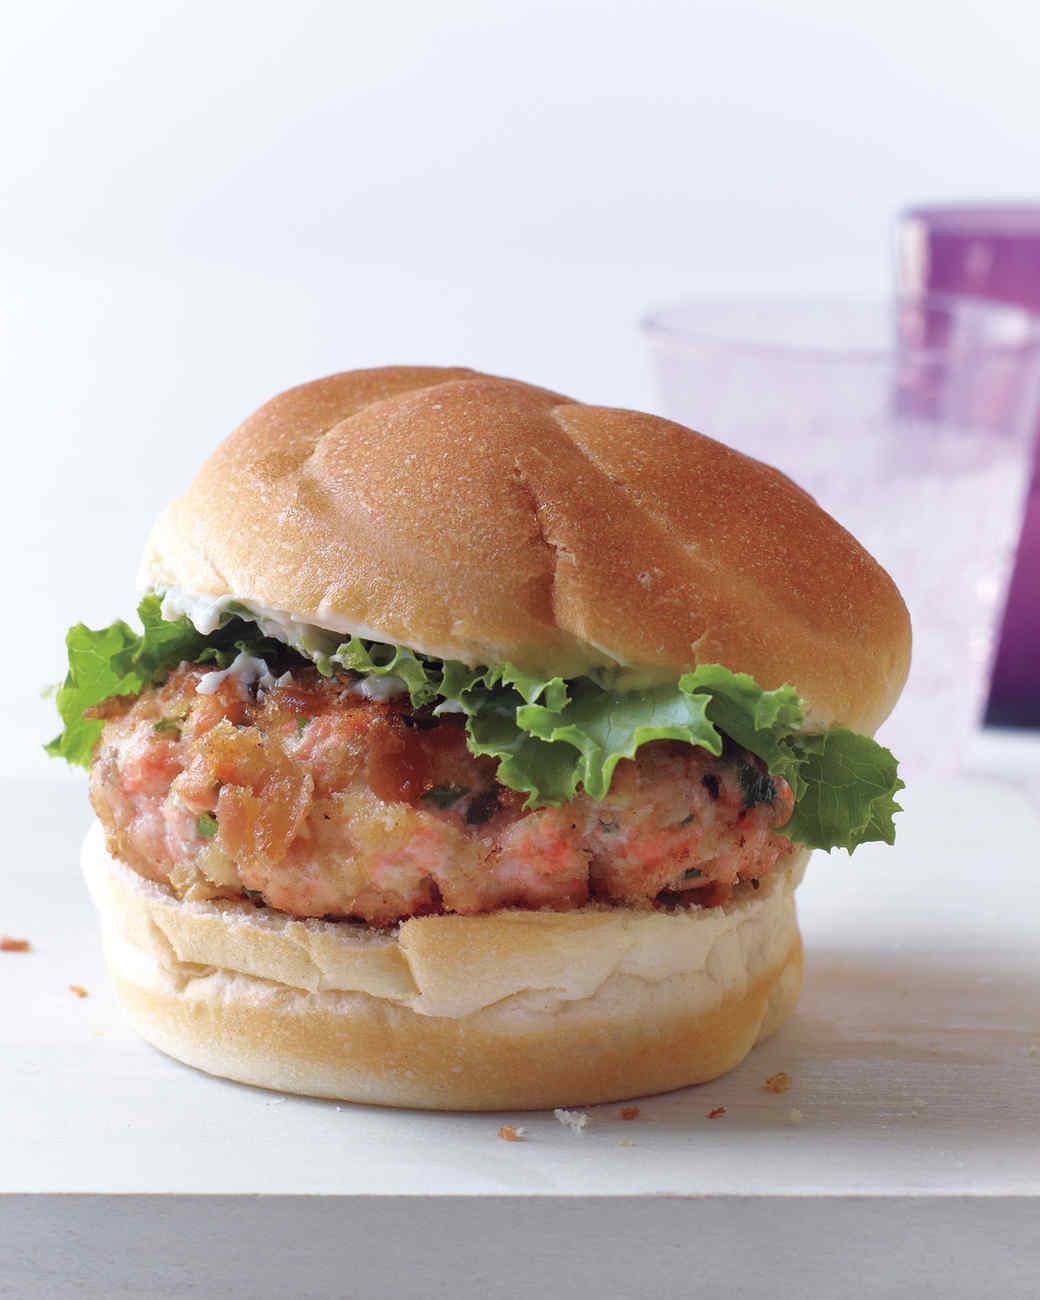 edf-loves-salmon-burgers-032-med109000.jpg